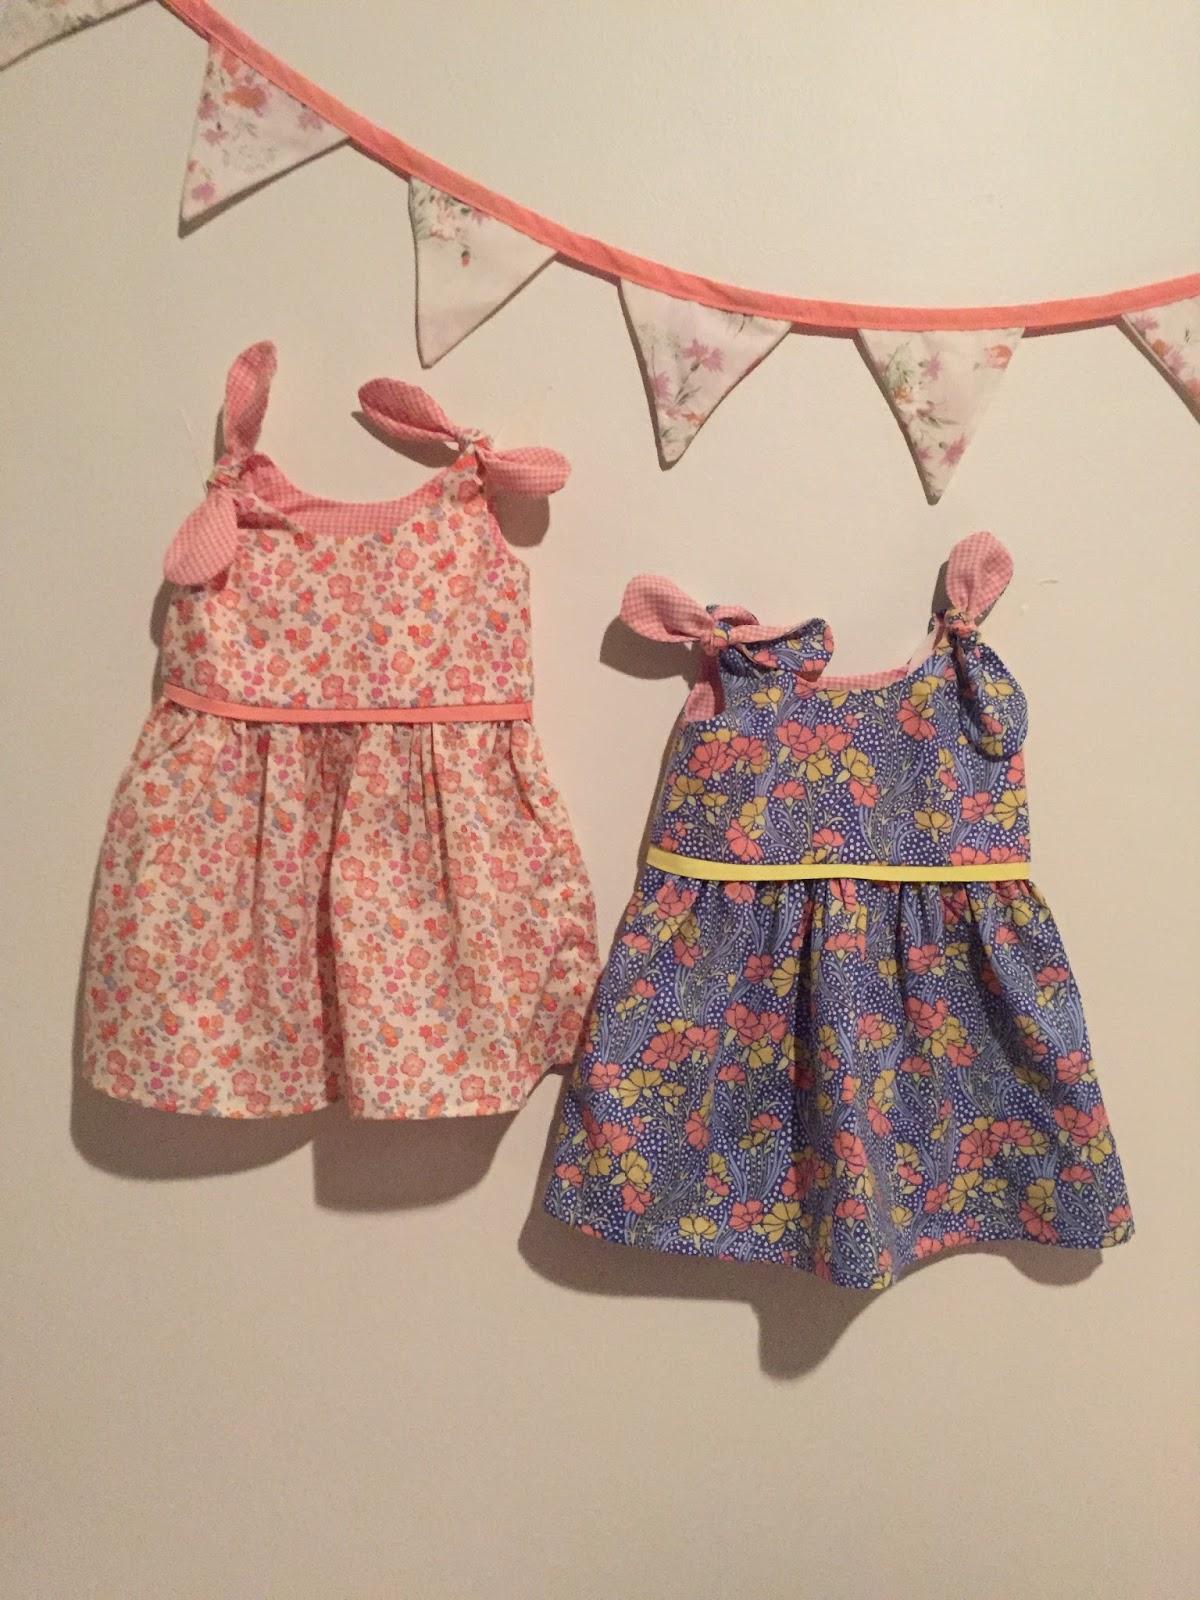 Sewn By Elizabeth Itty Bitty Baby Clothes